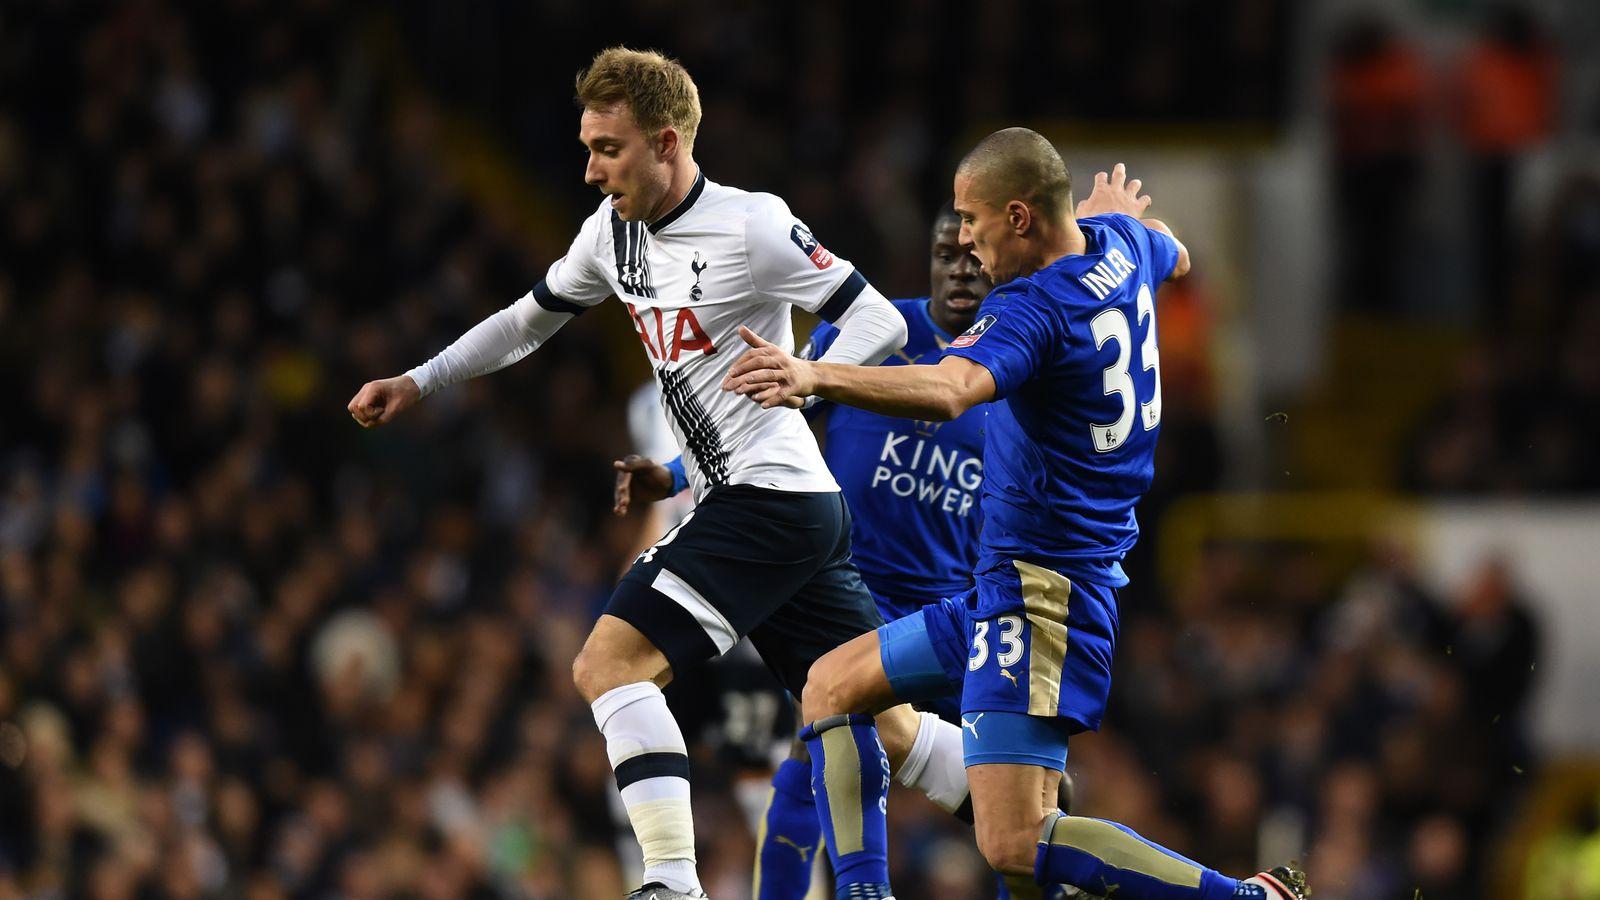 Tottenham Vs Leicester Live Stream: Tottenham Hotspur Vs. Leicester City Live Stream 2015